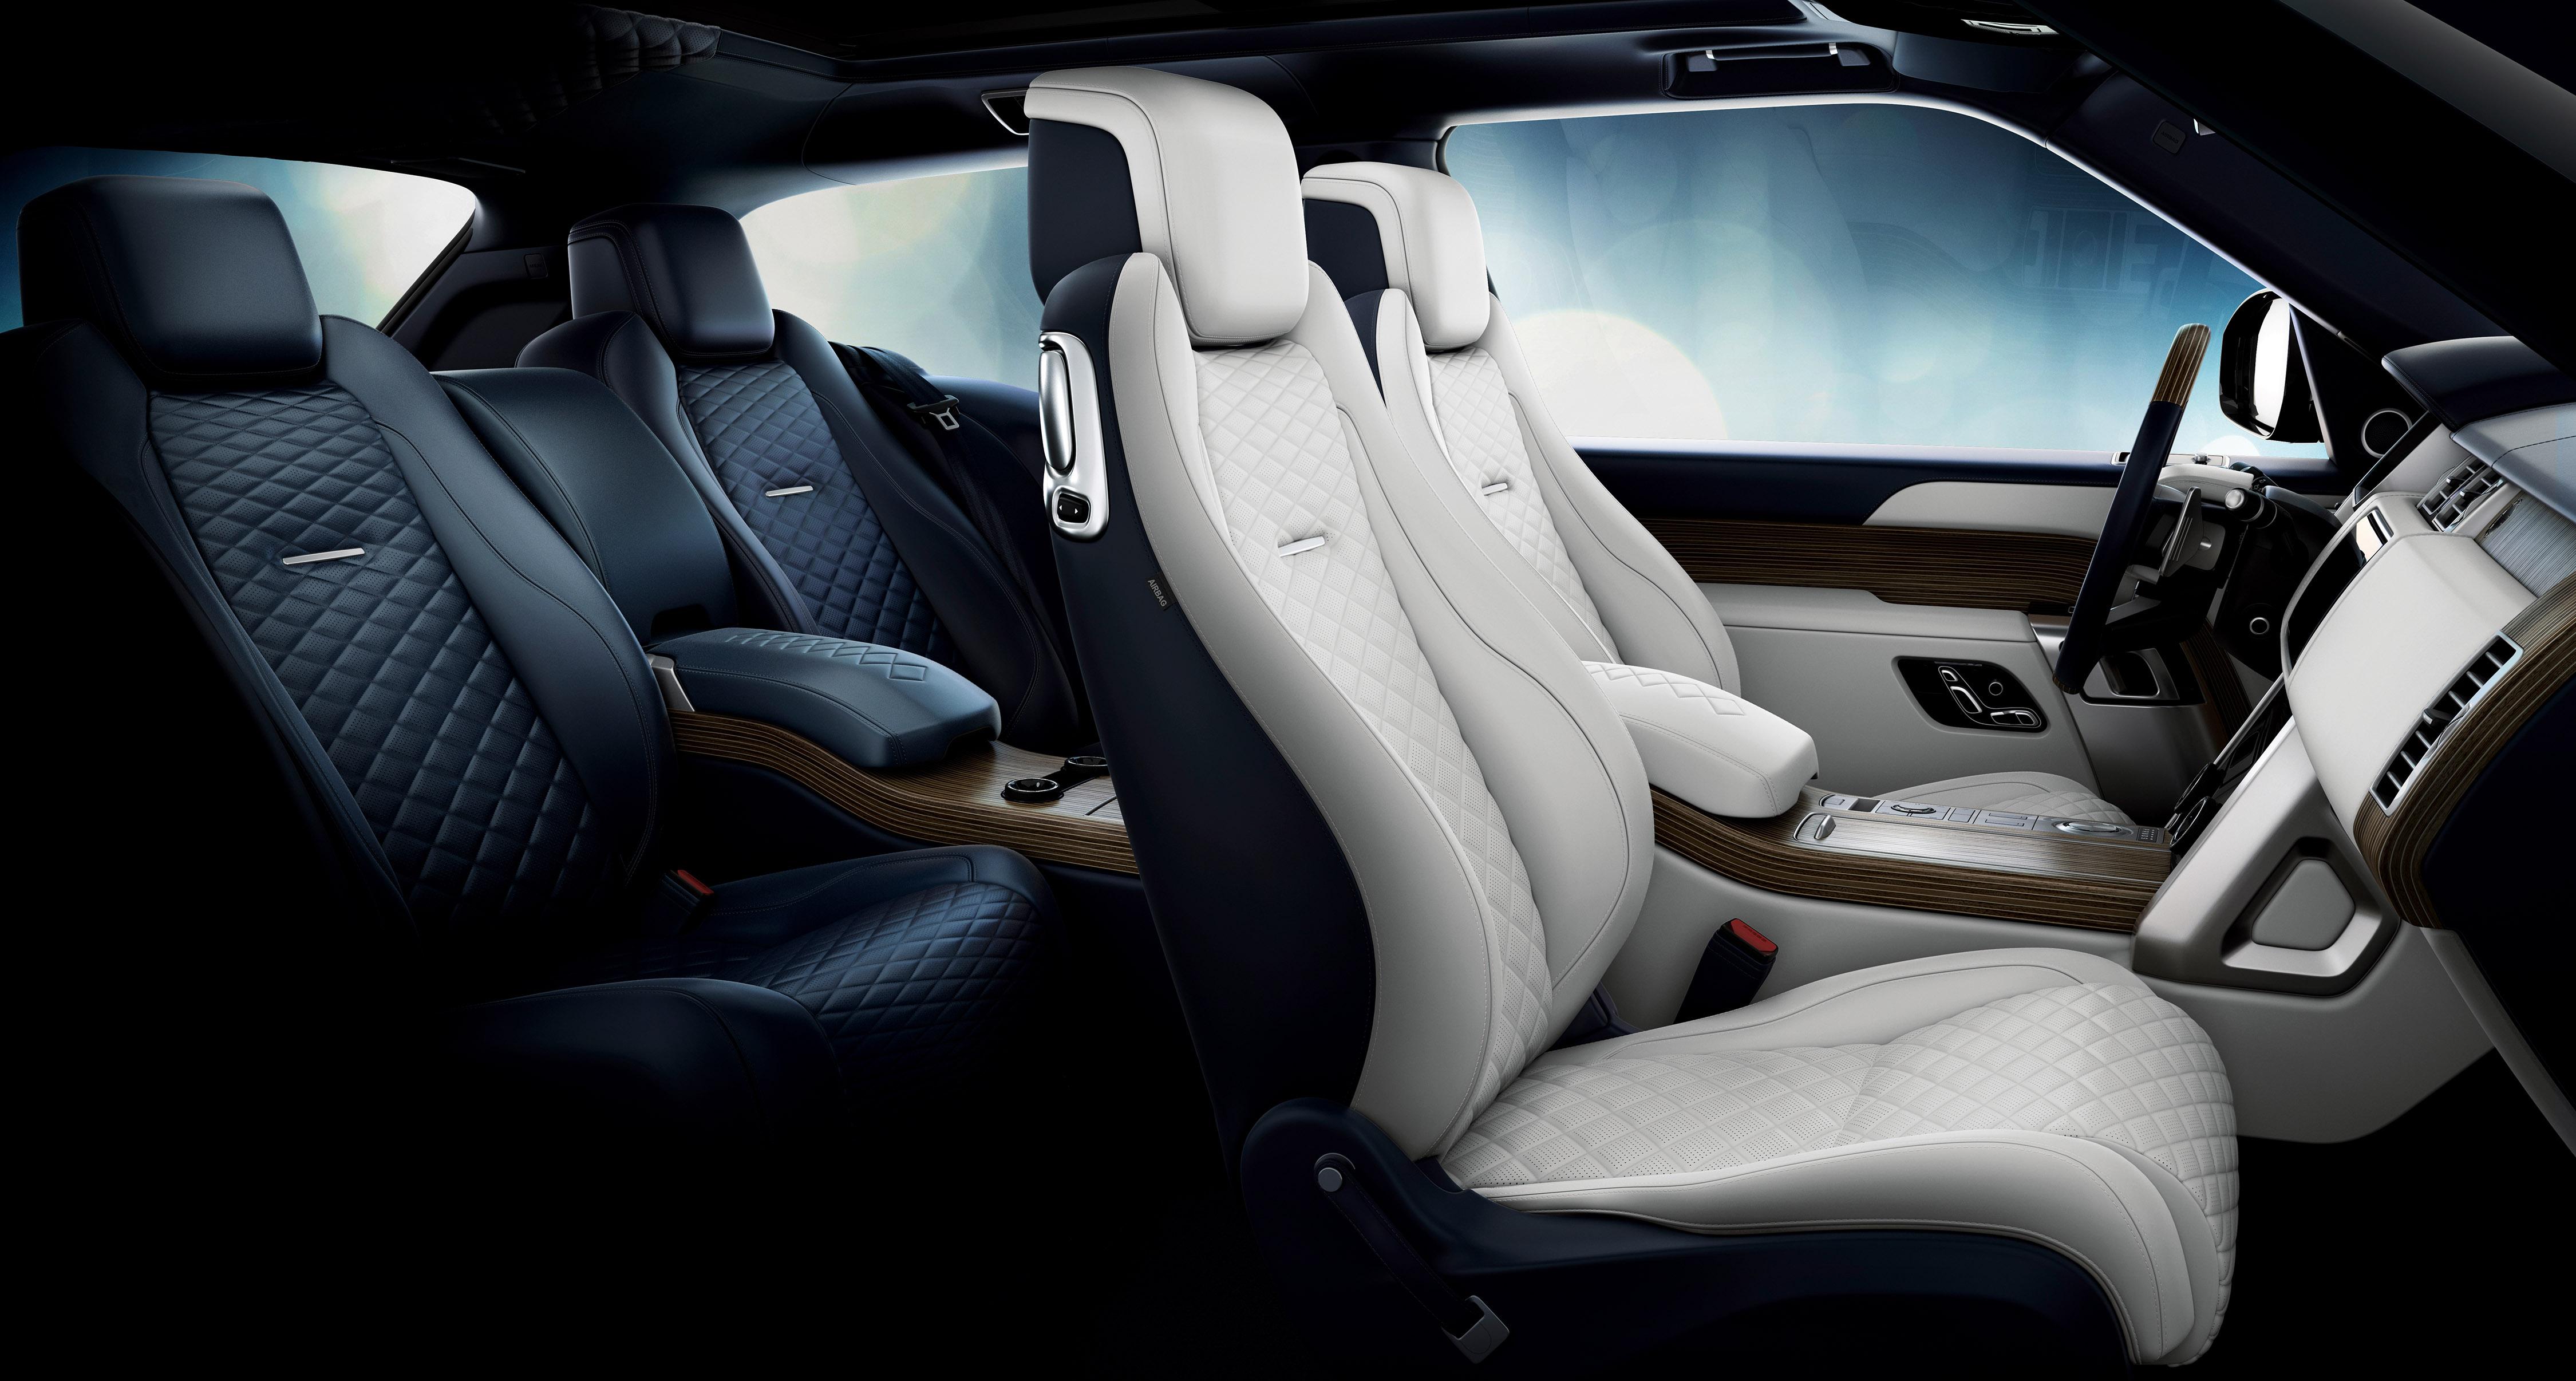 273761 11 range rover sv coupe 6b2d96 original 1519909284